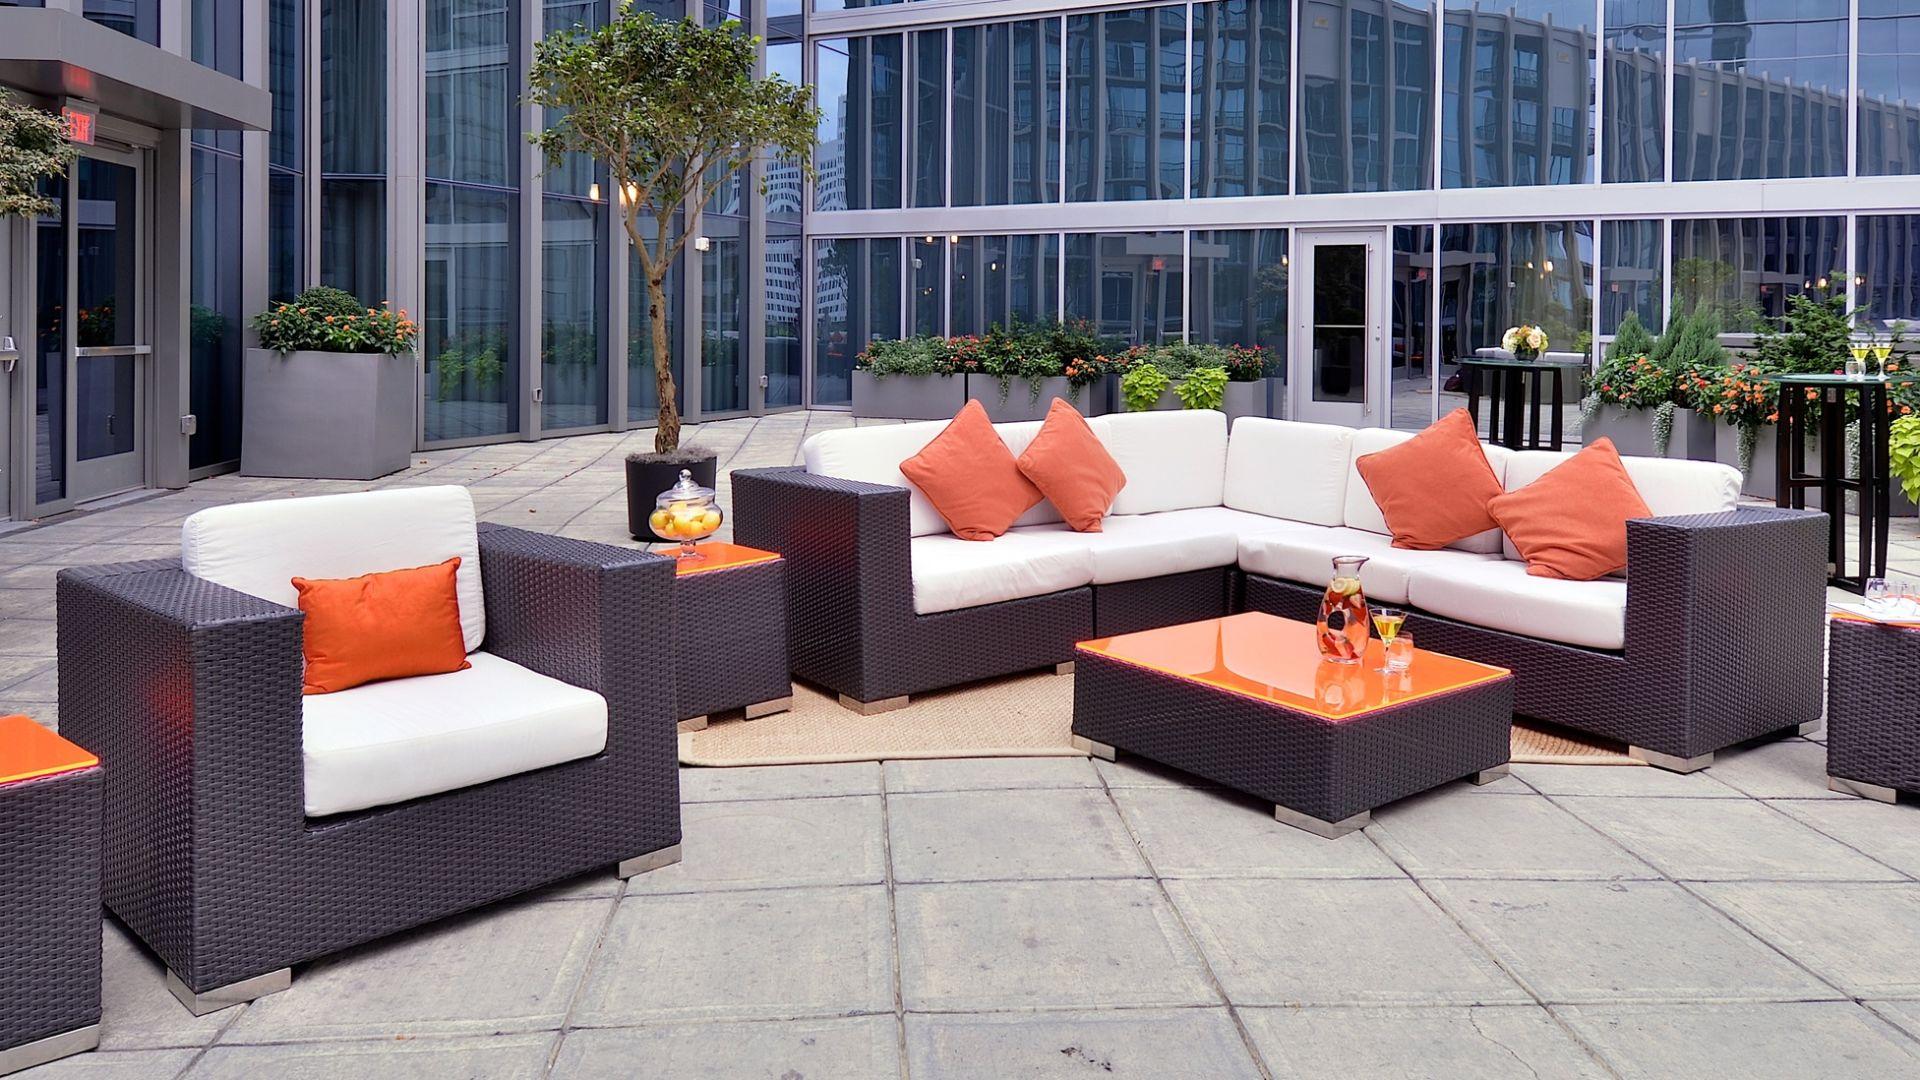 Terrace for Events | Loews Atlanta Hotel